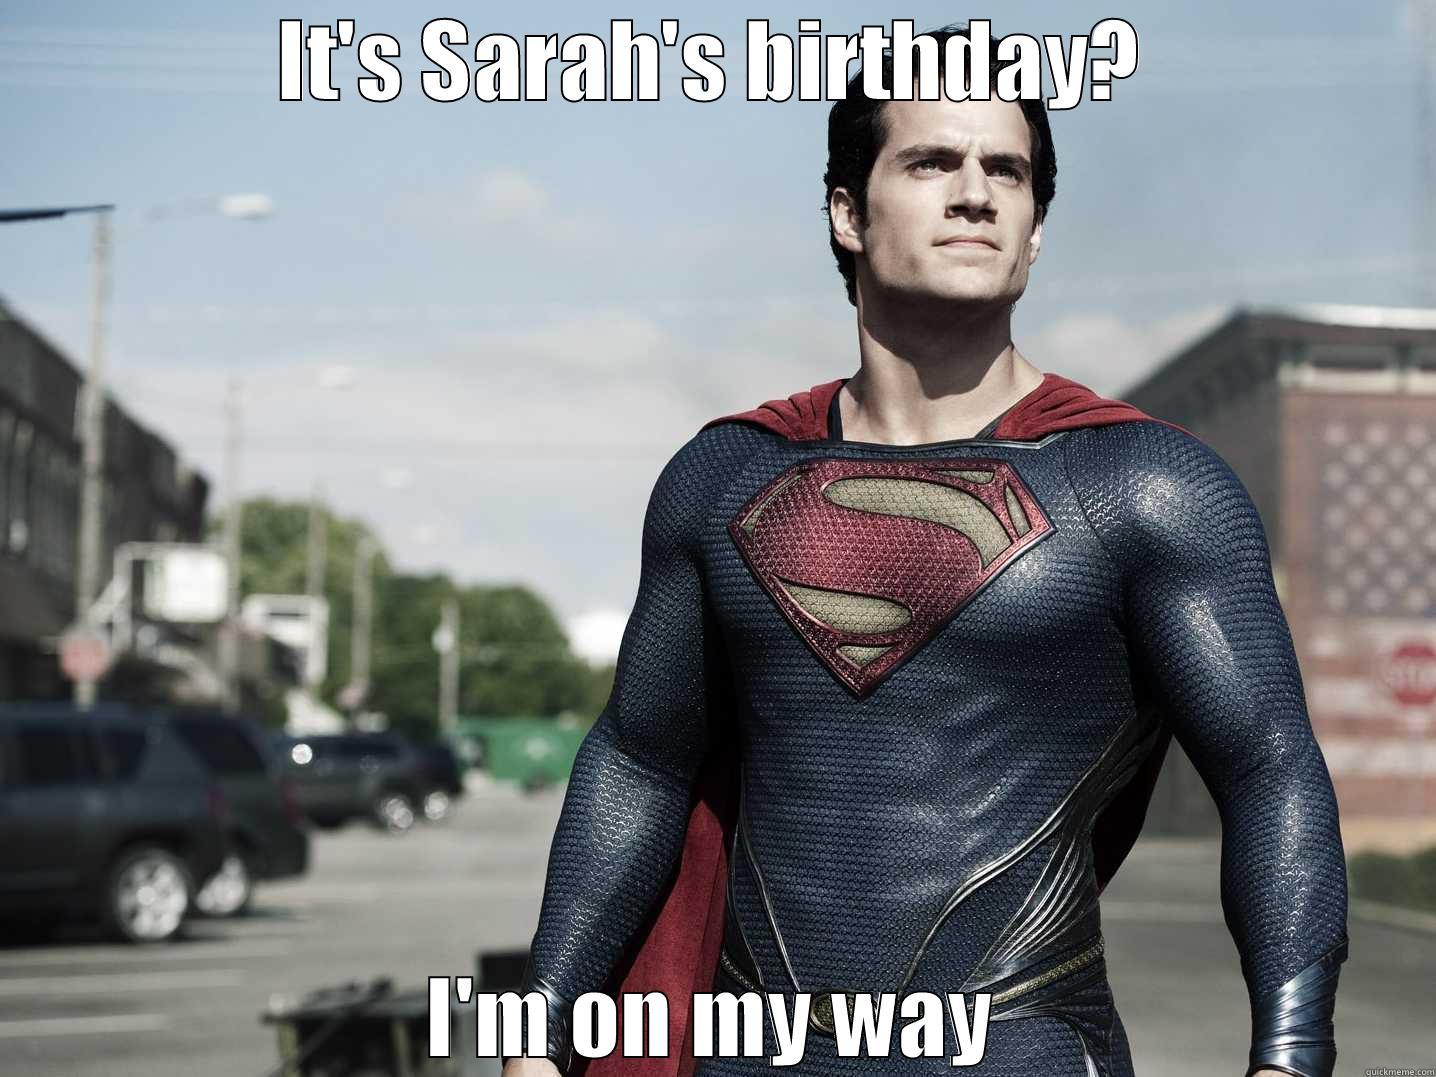 fb366efbdadc6b2ac6e407c6856ced46731a025a7cb9d234ddd04ac8019ca3e4 sarah birthday meme quickmeme,Sarah Meme